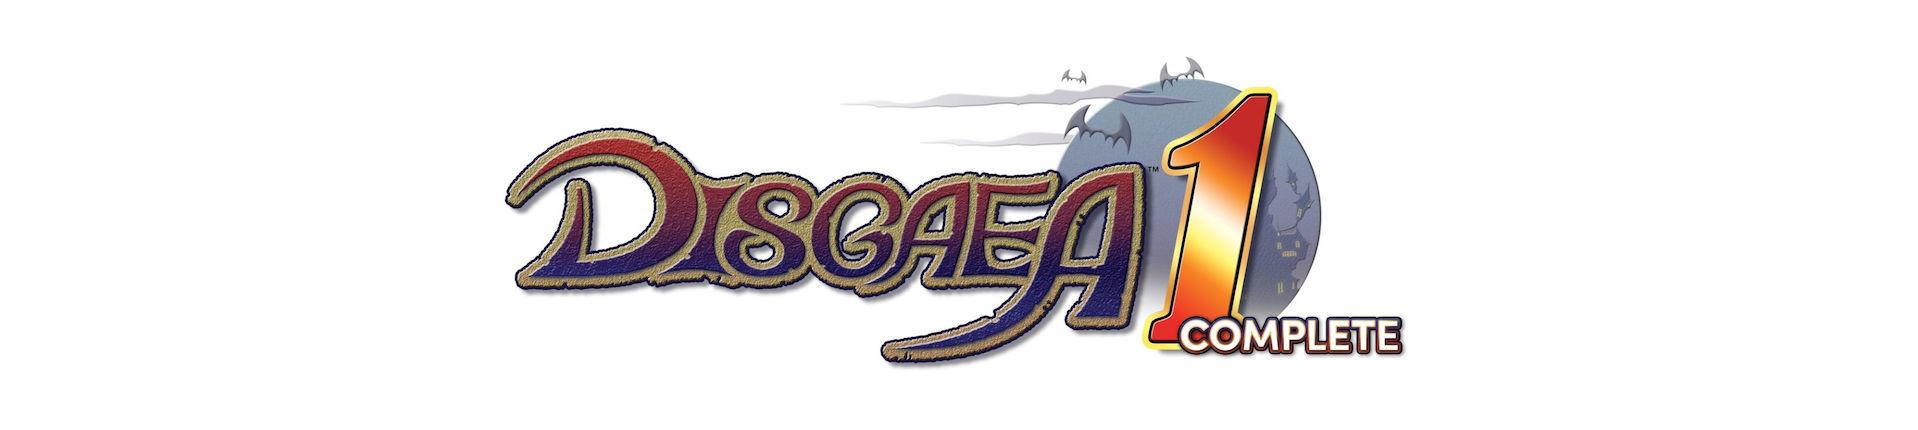 <a href='https://www.mightygamesmag.de/all-game-list/disgaea-1-complete/'>Zum Spiel</a>